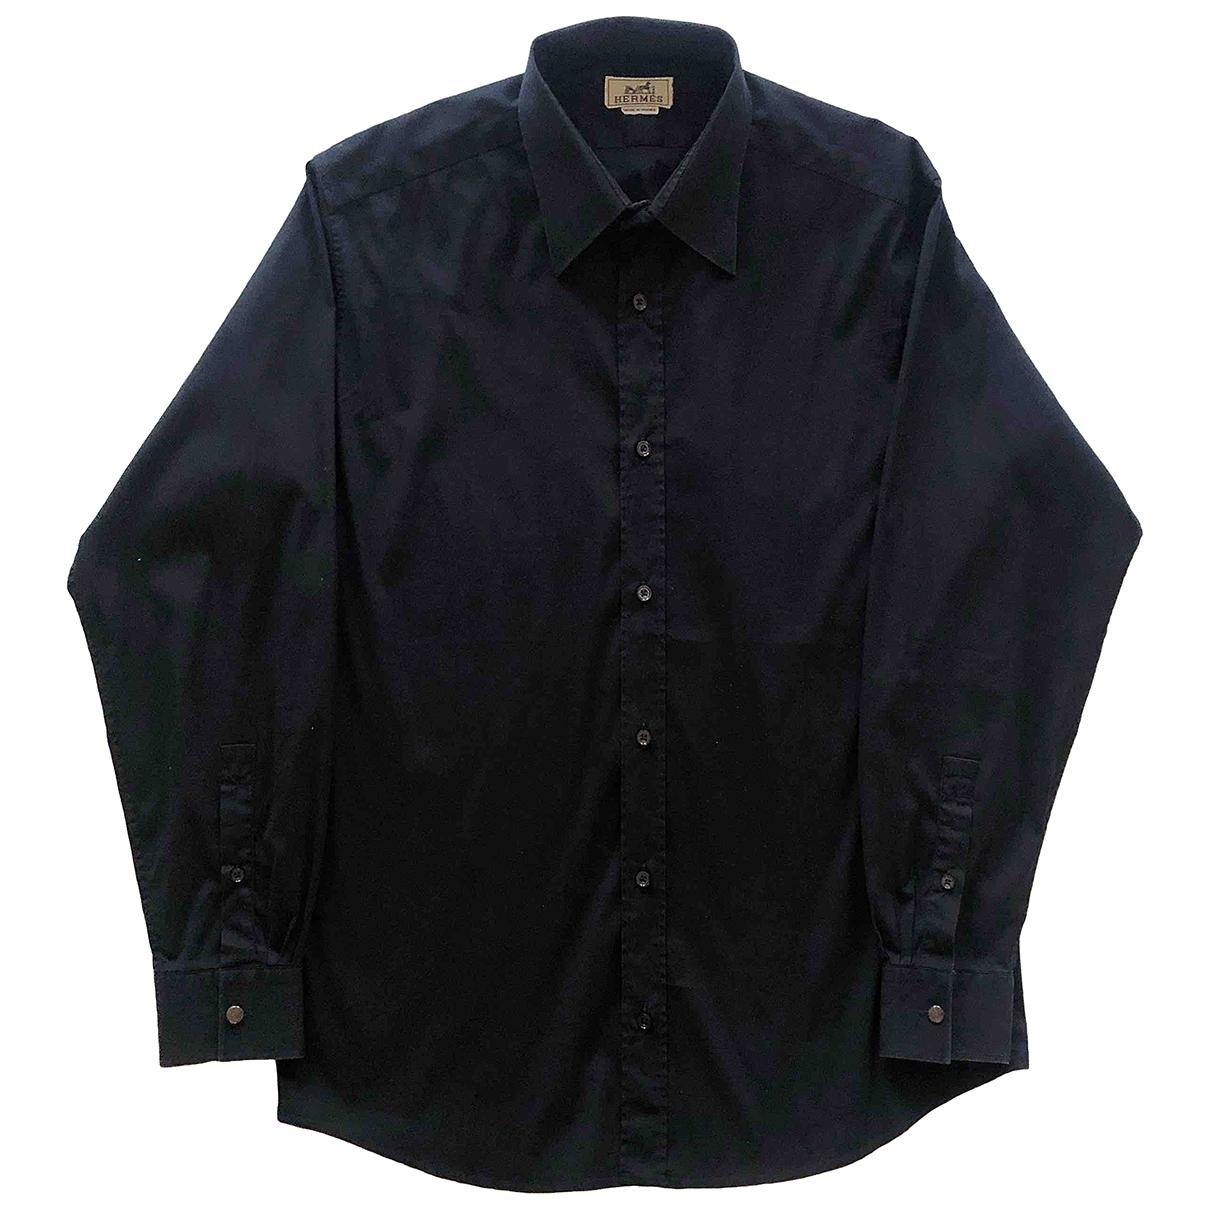 Hermès \N Black Cotton Shirts for Men 42 EU (tour de cou / collar)